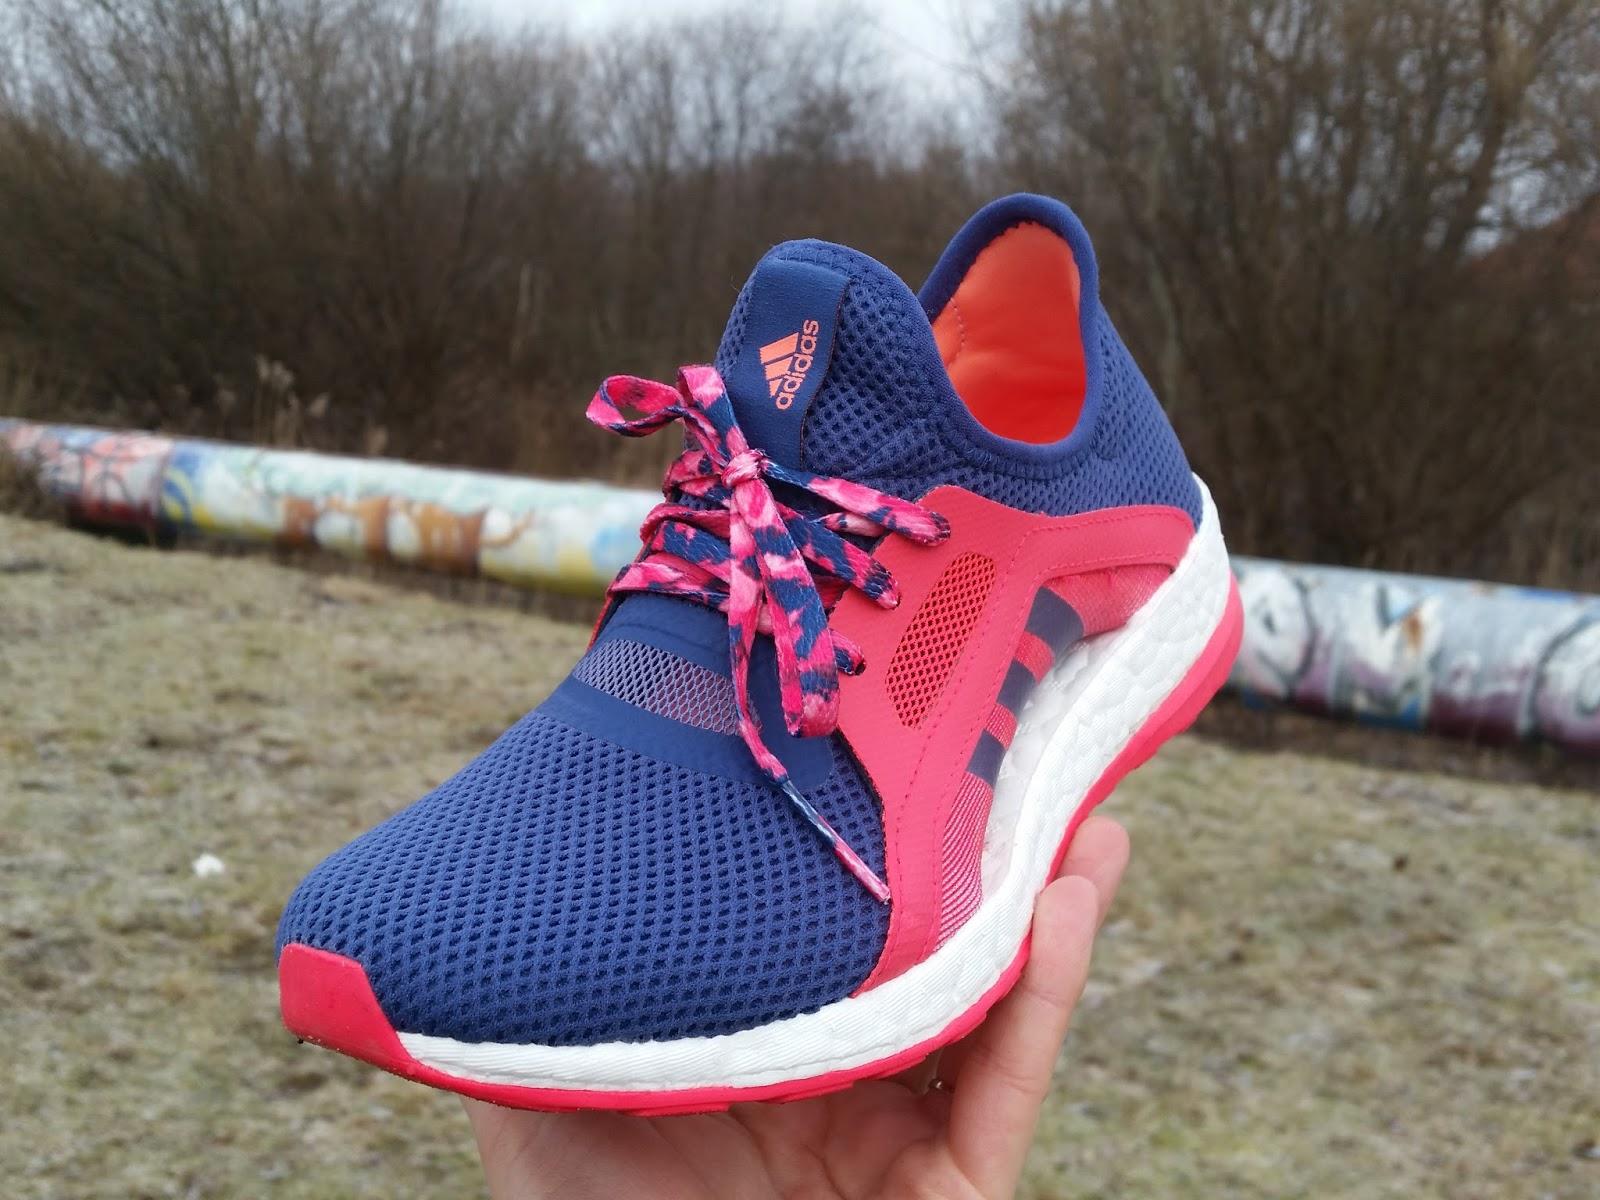 cf7cc84bcc809 buty do biegania adidas pure boost x opinie Poland